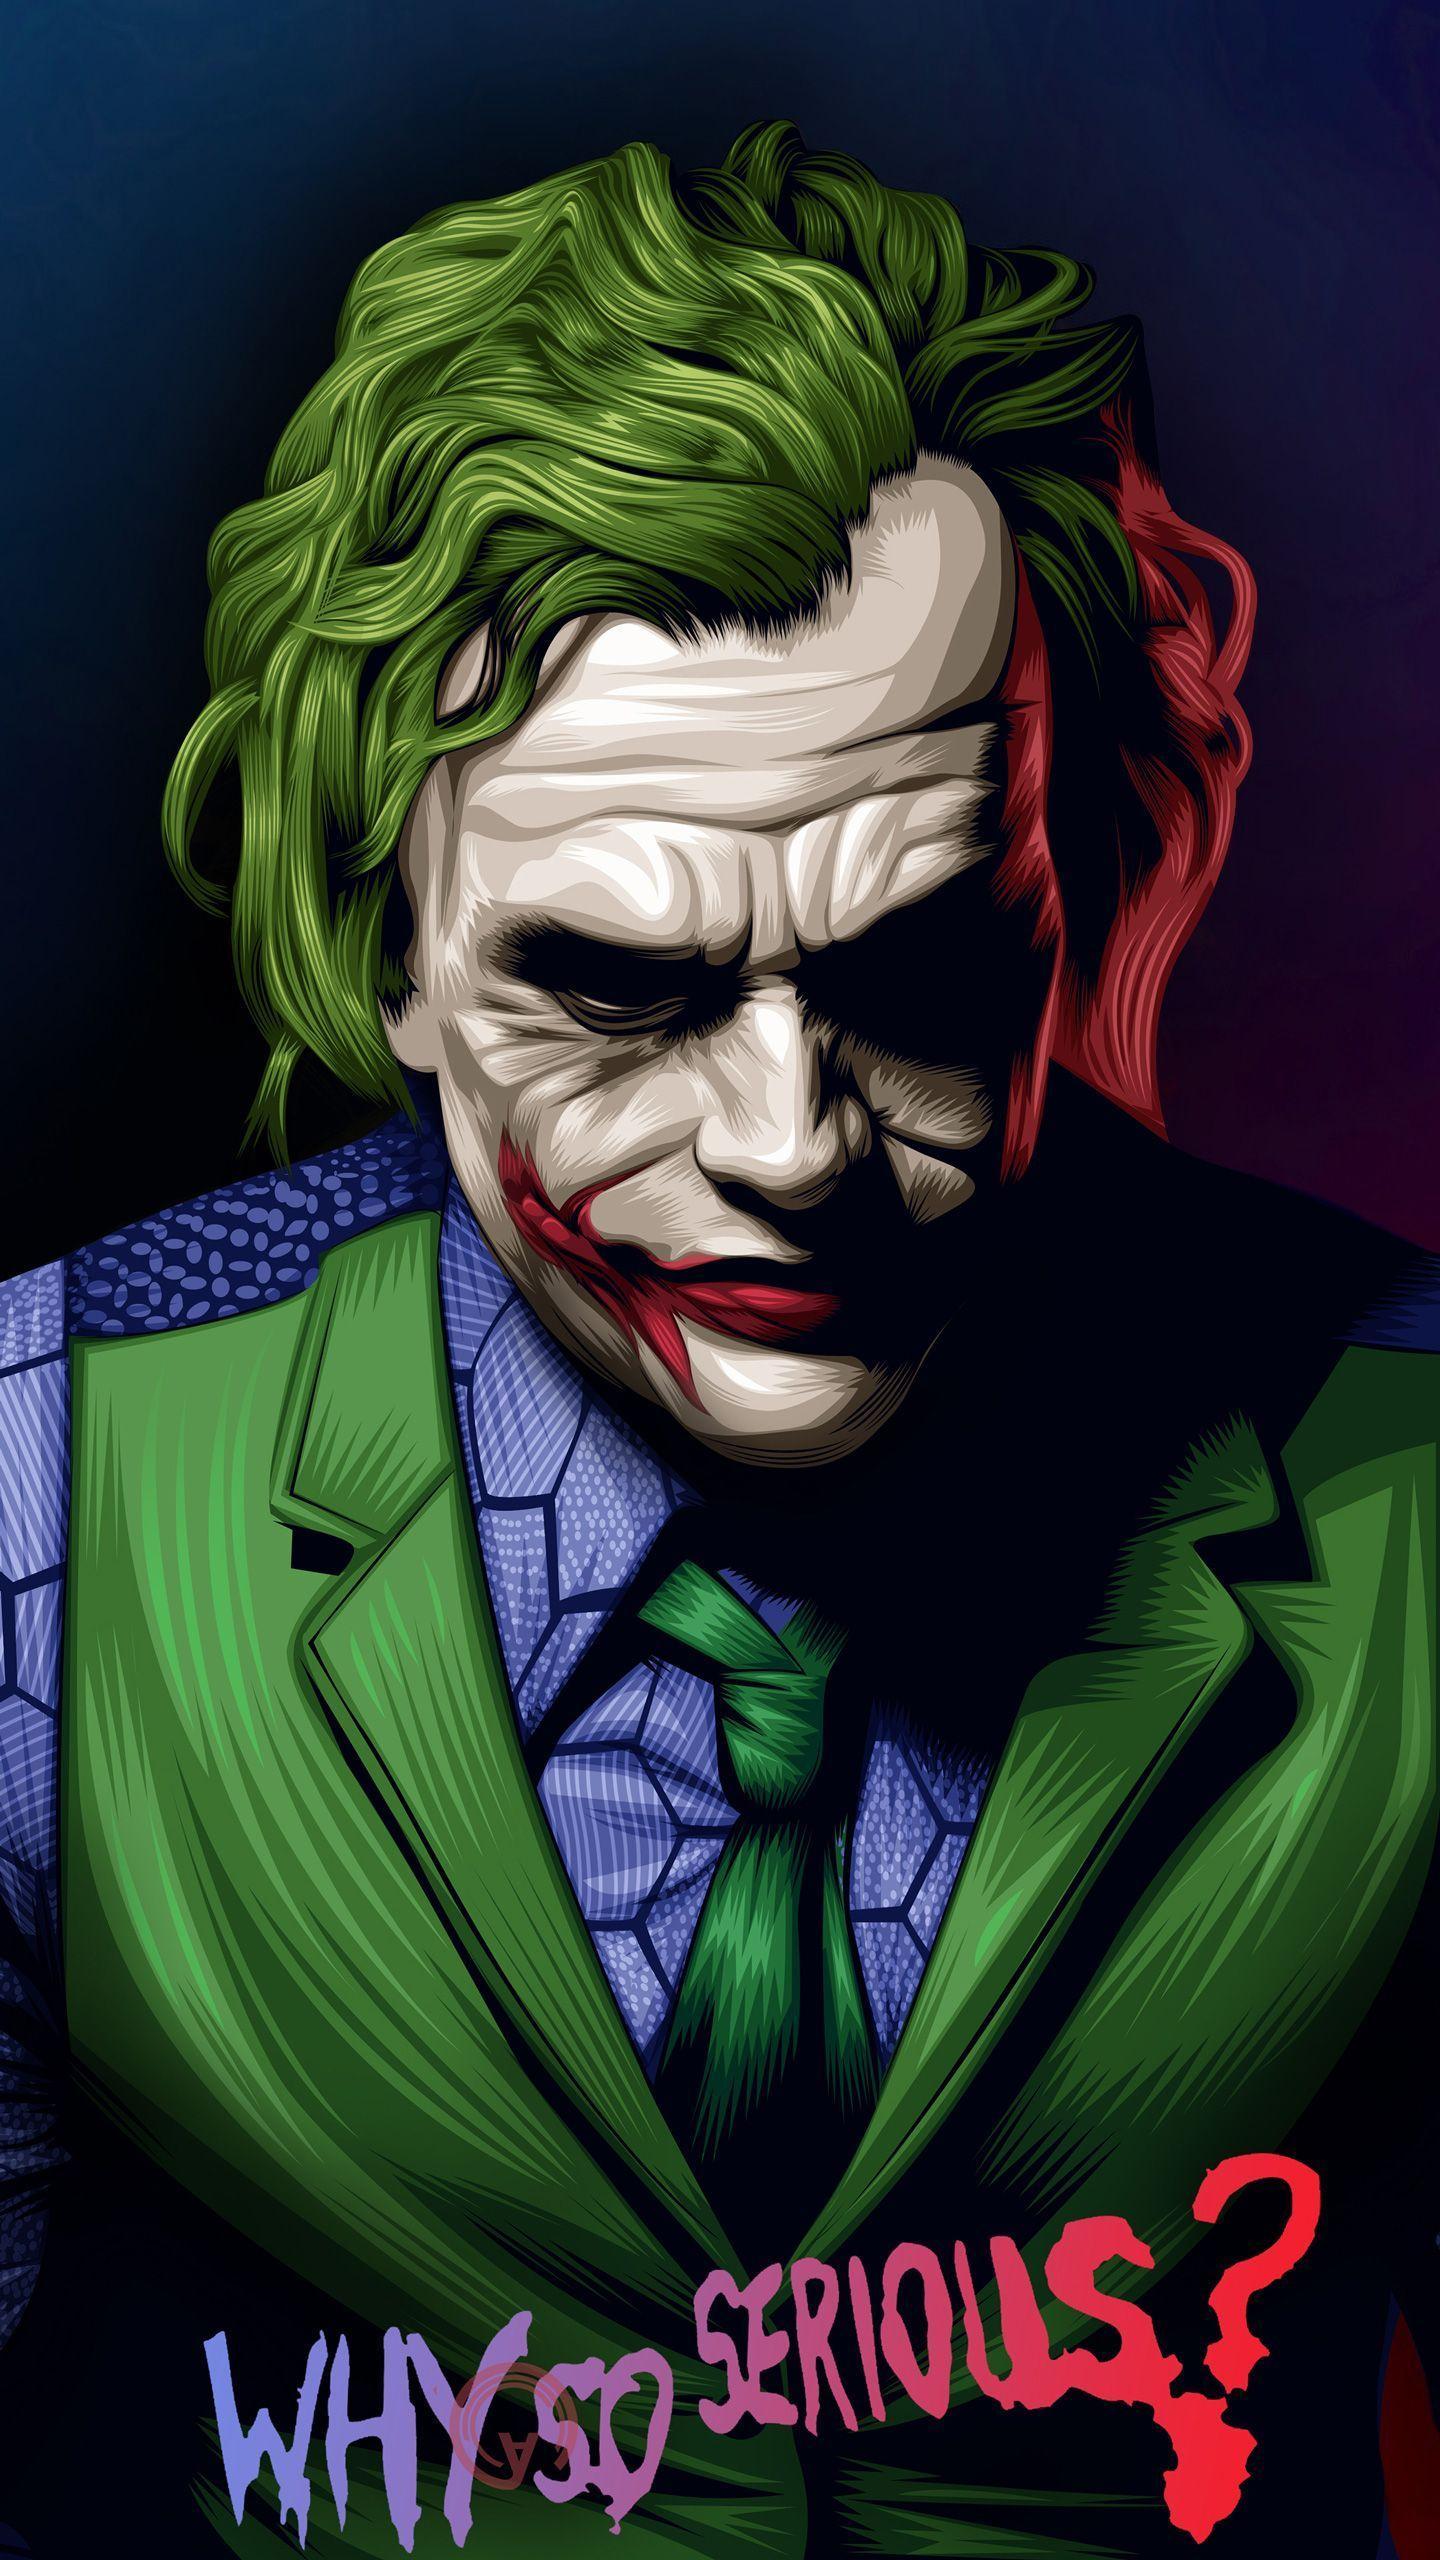 Joker Art Wallpapers Top Free Joker Art Backgrounds